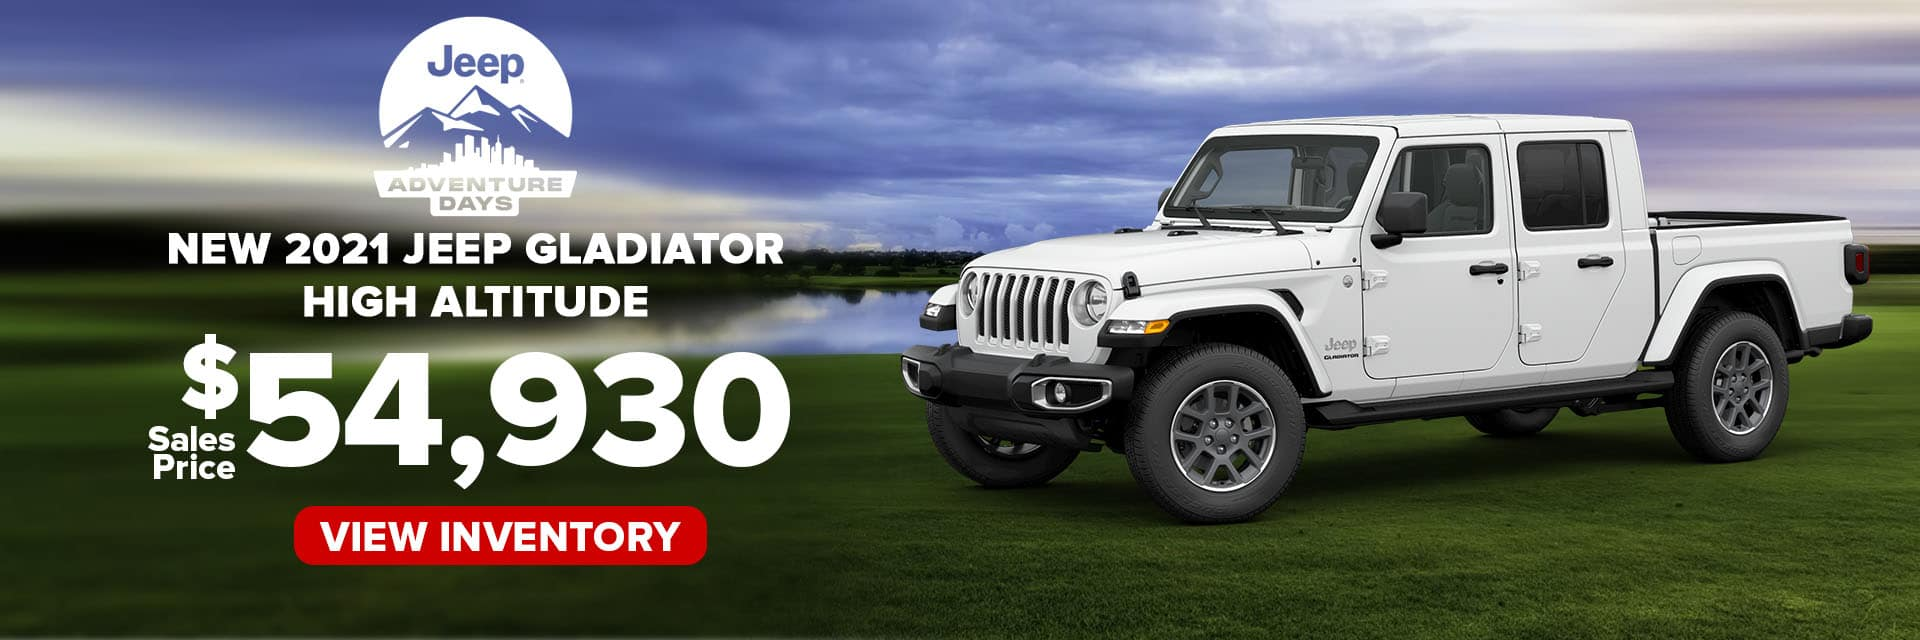 SLCJ-October 2021-2021 Jeep Gladiator copy